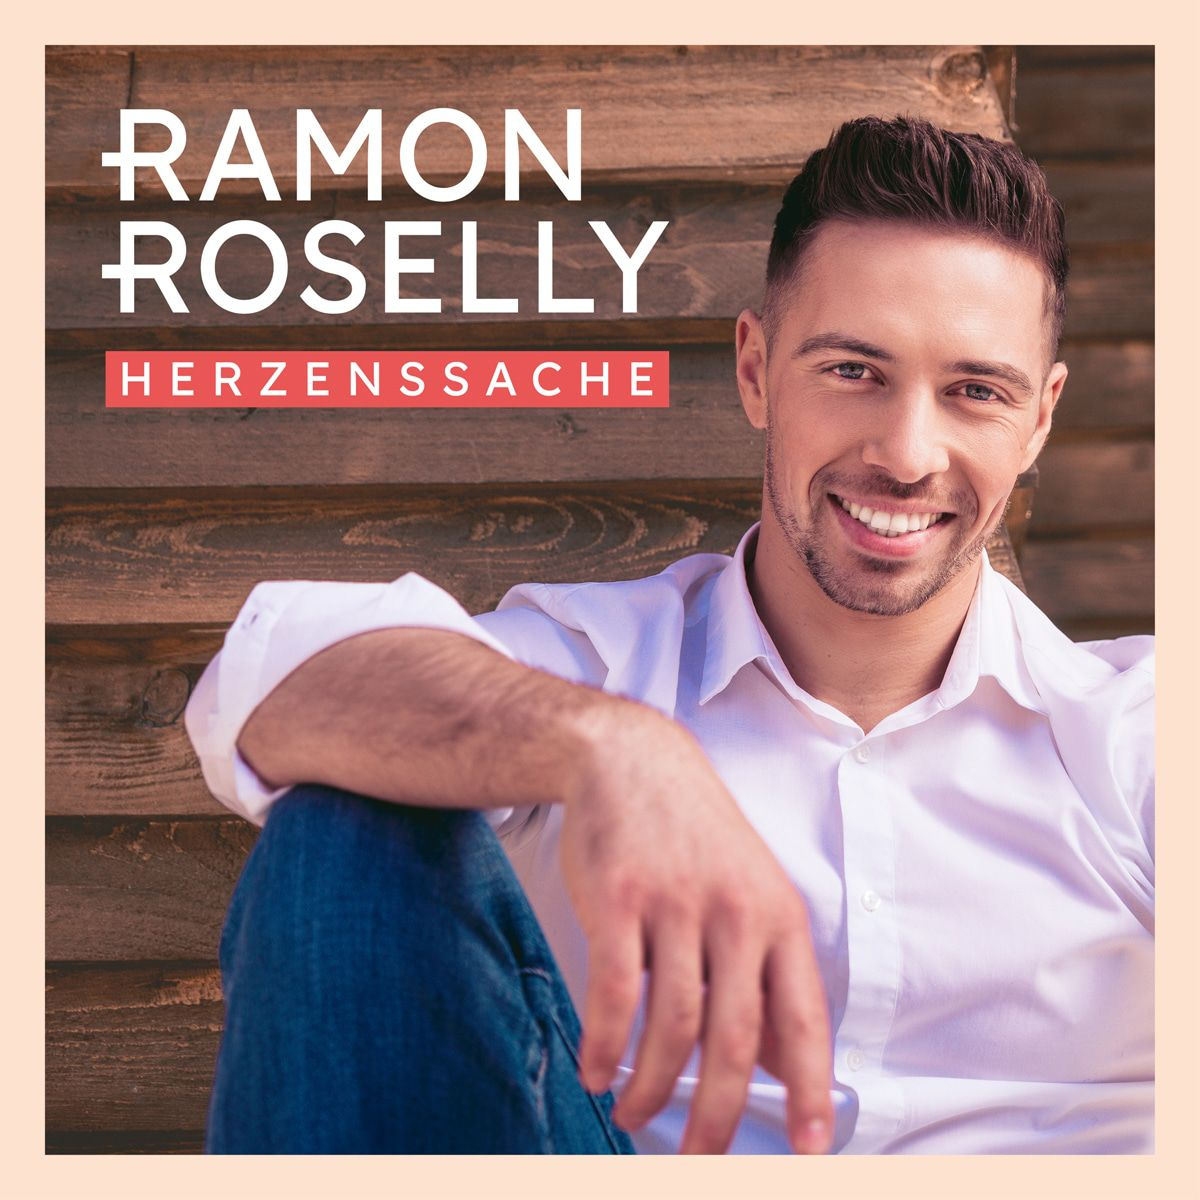 Ramon Roselly schreibt DSDS-Geschichte - Album kommt am 10. April